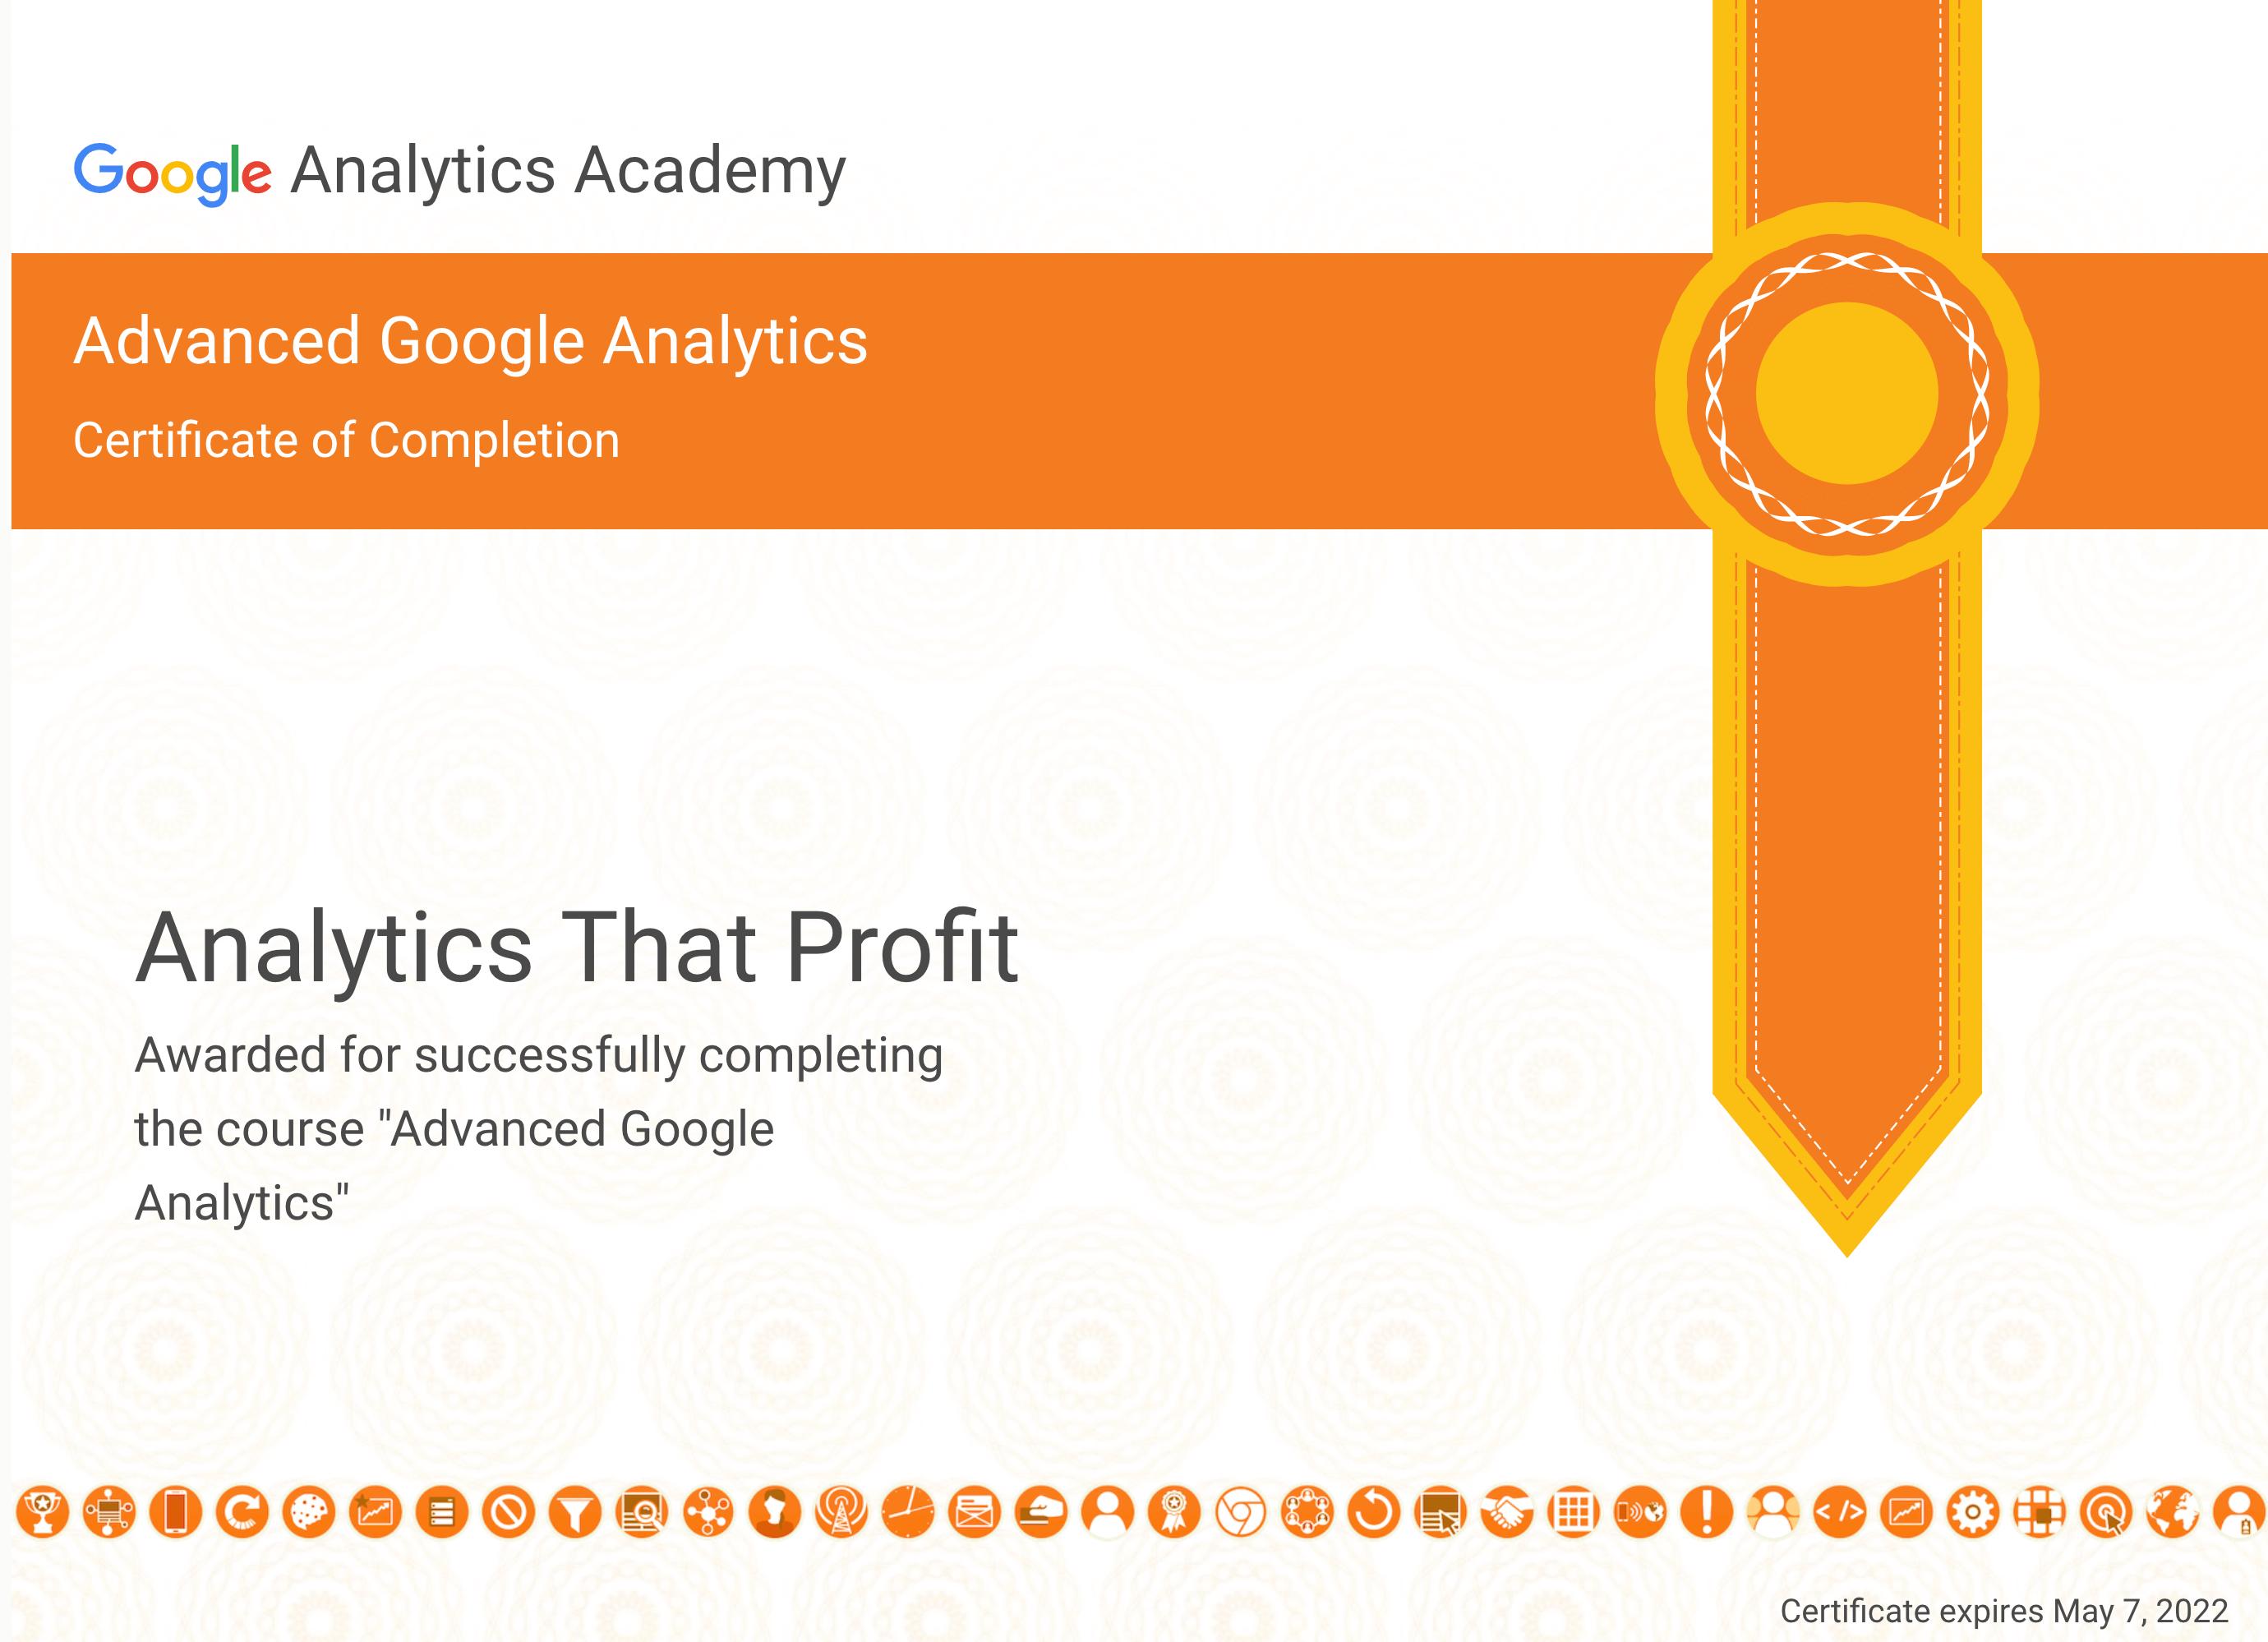 Advanced Google Analytics 2022